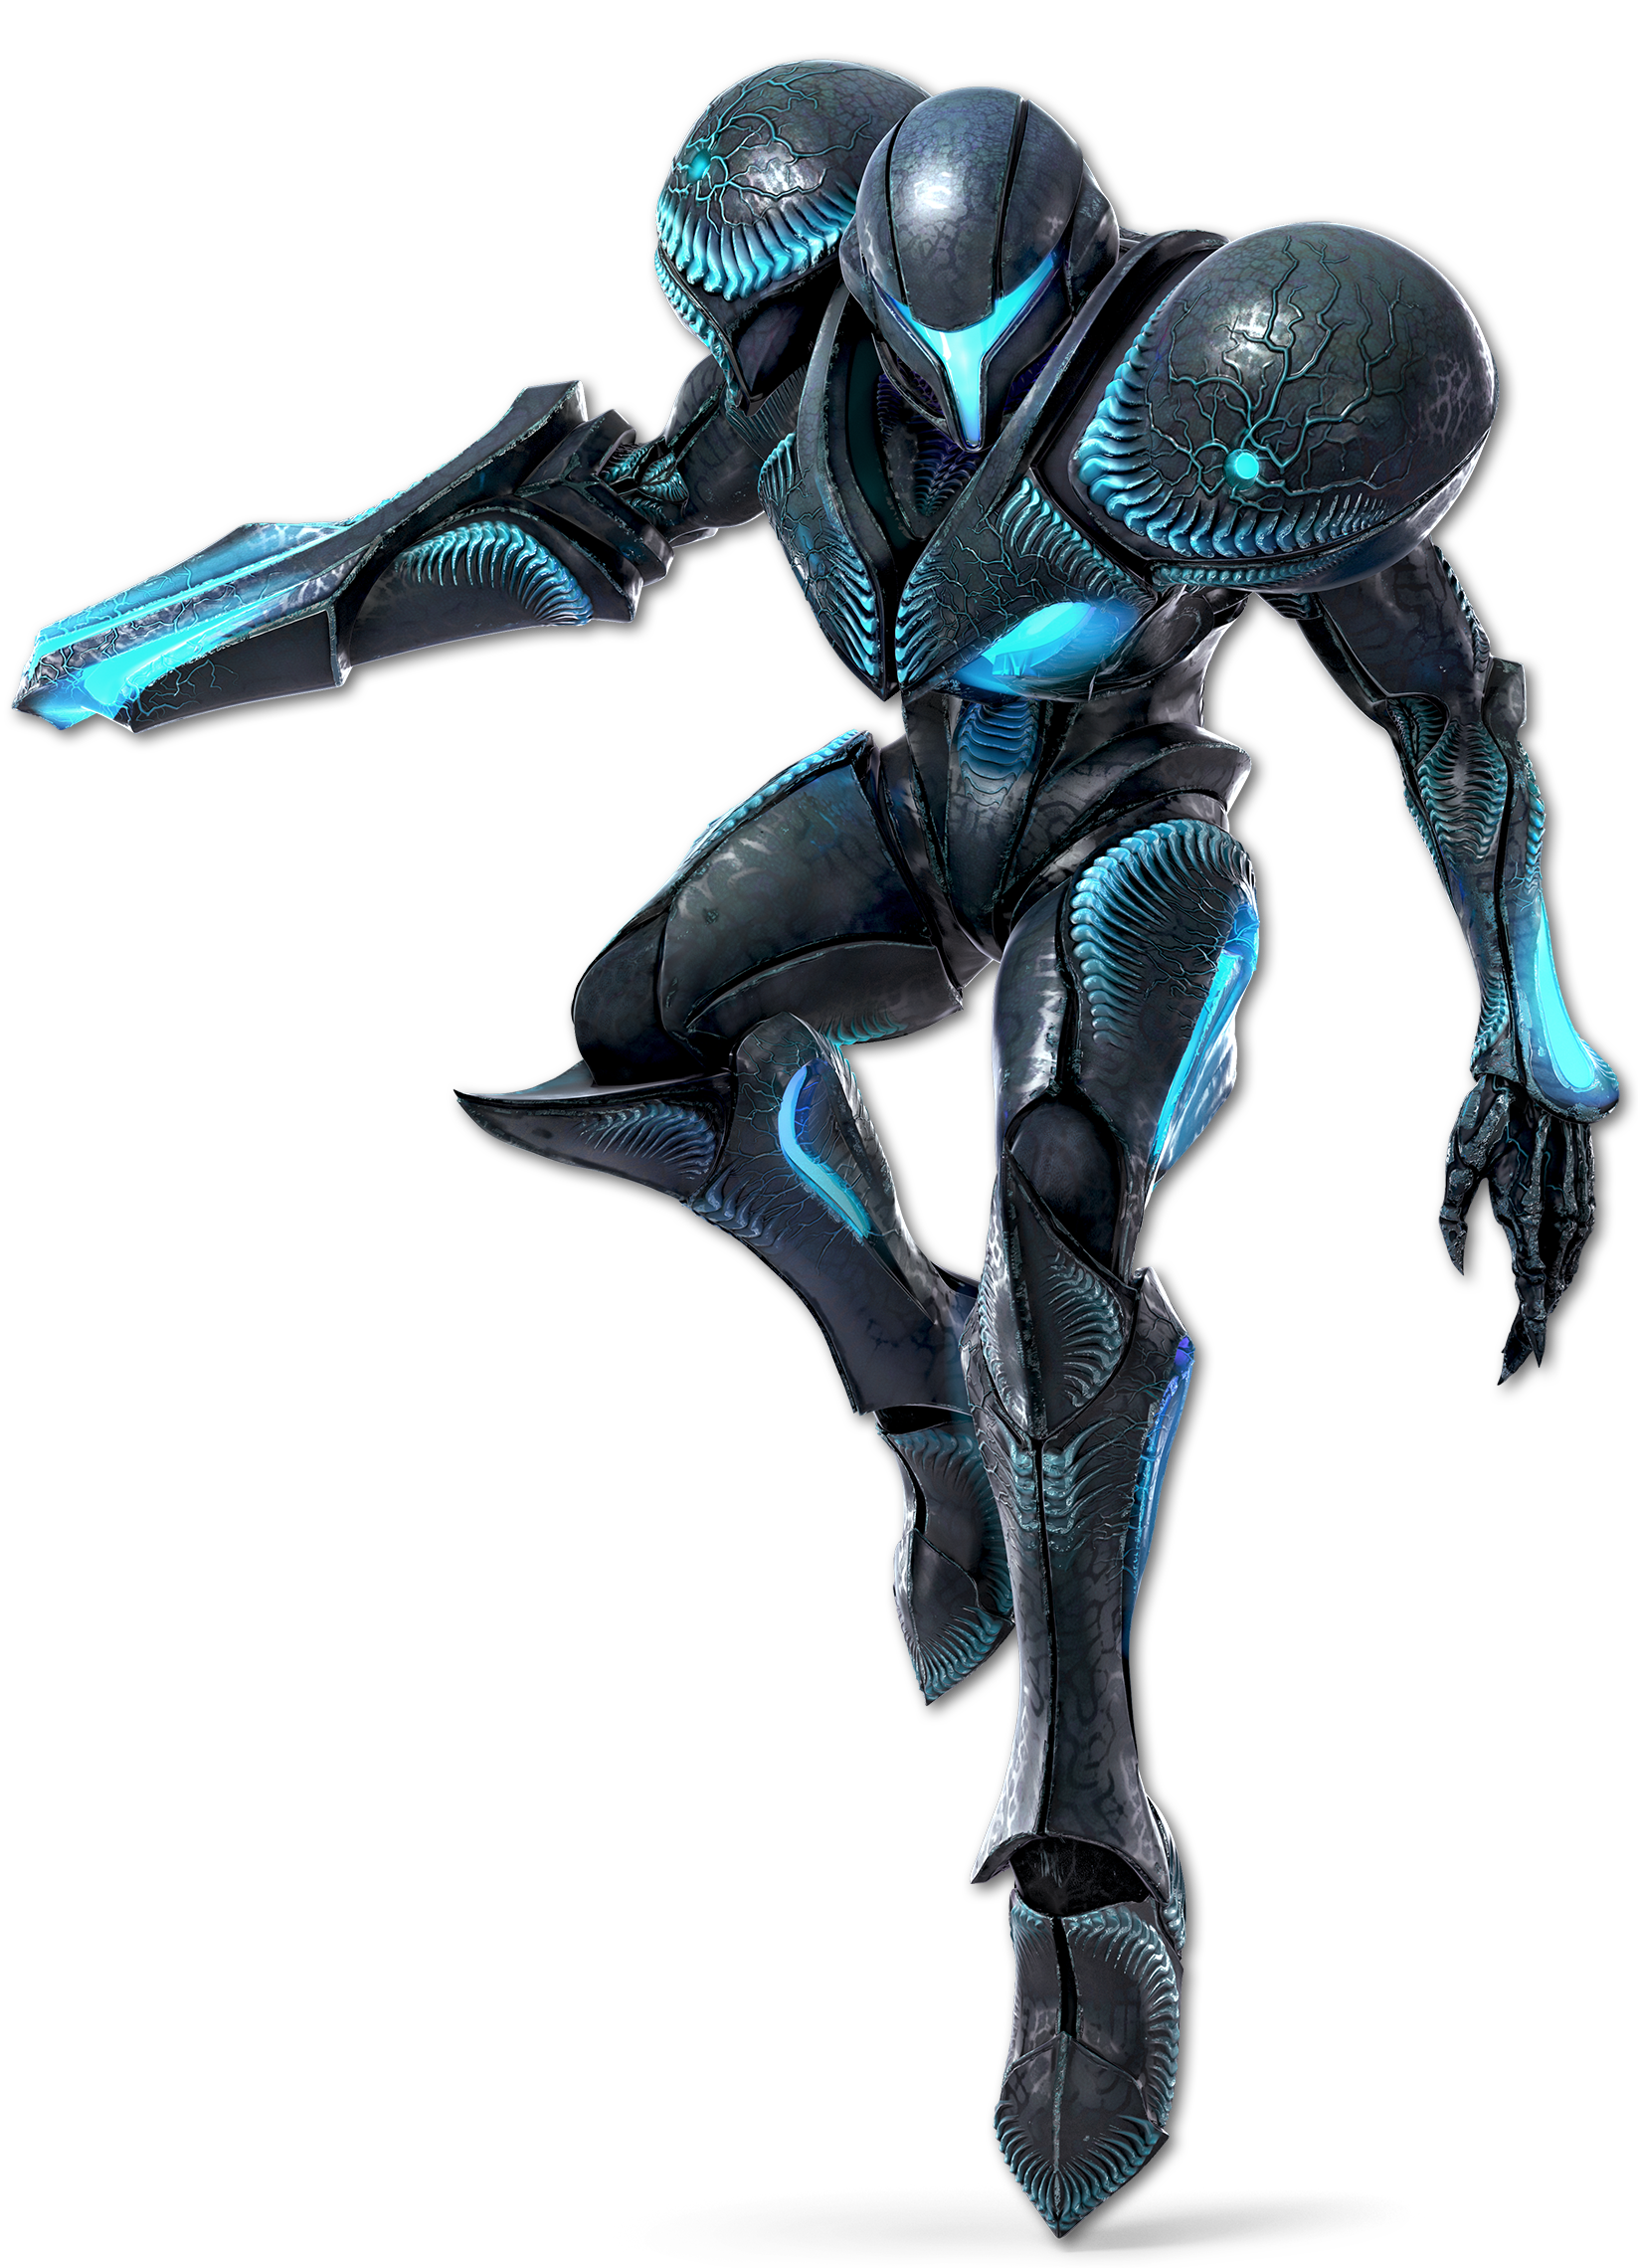 Dark Samus (Super Smash Bros. Ultimate)